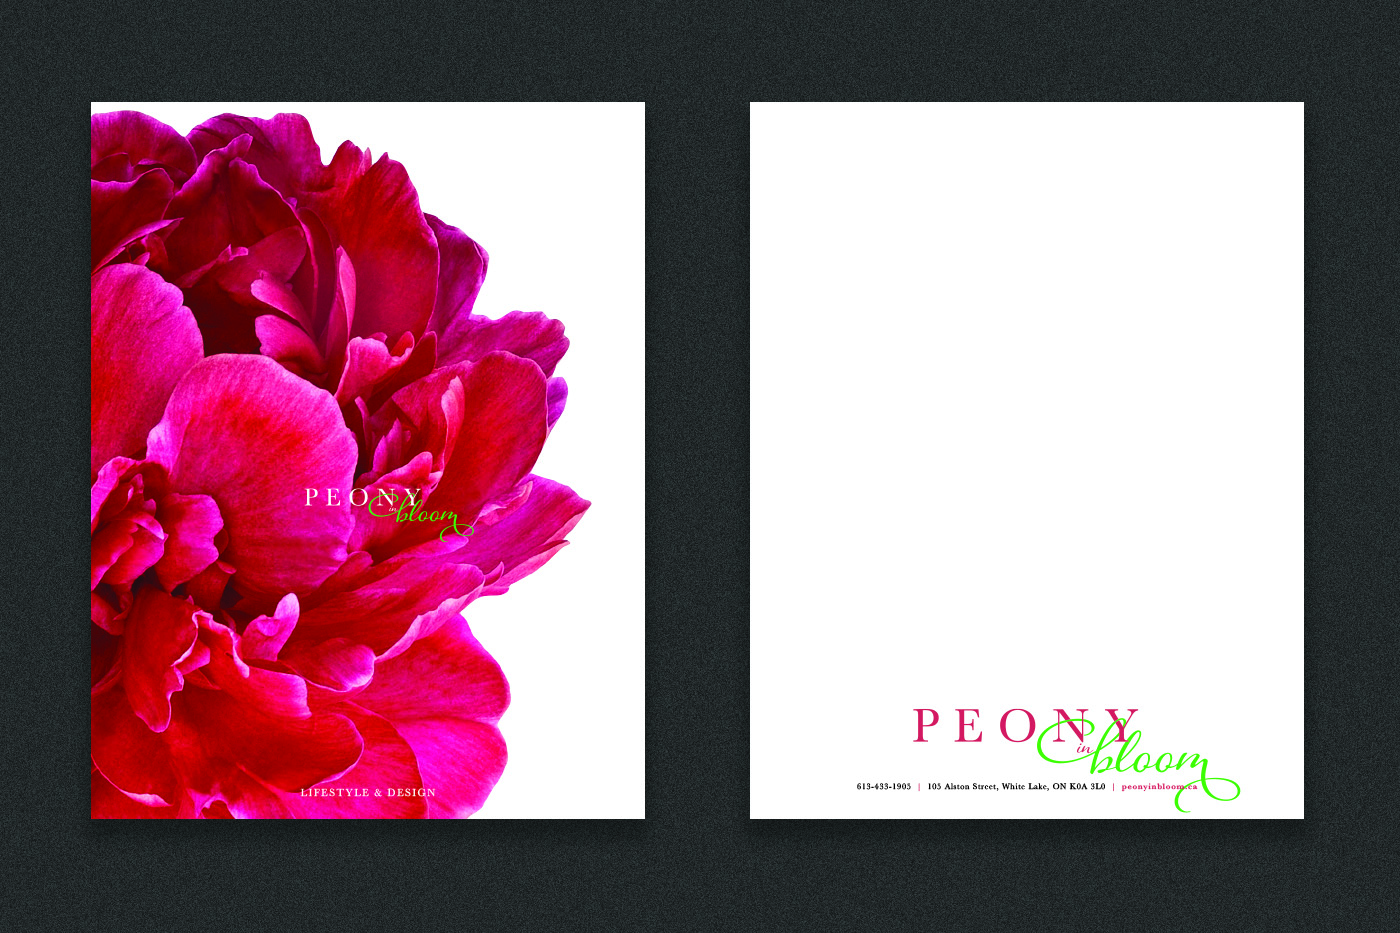 Peony-In-Bloom-logo-stationary-letterhead-brand-design.jpg